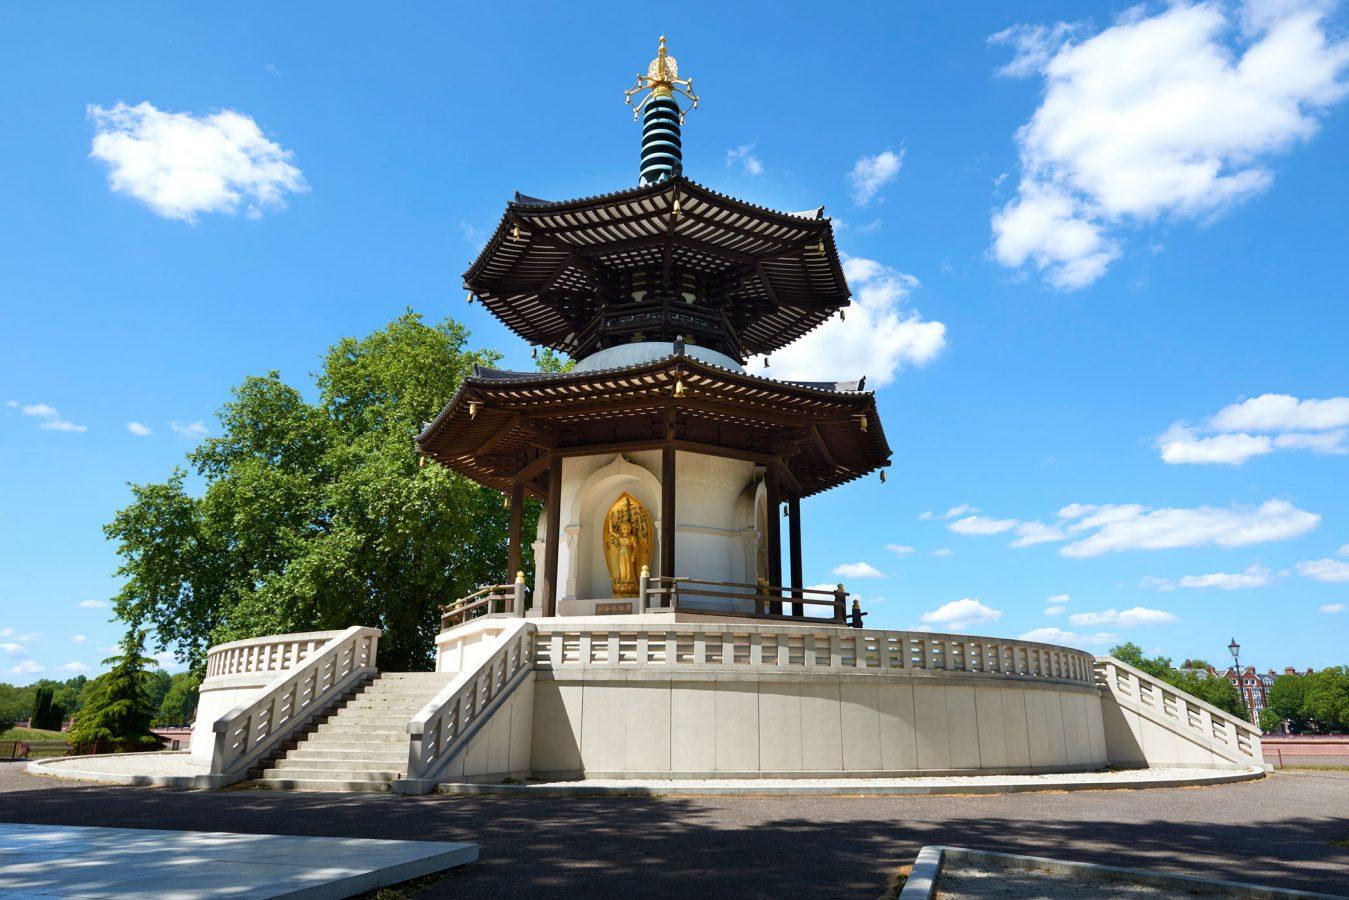 K Peace Pagoda Battersea Park